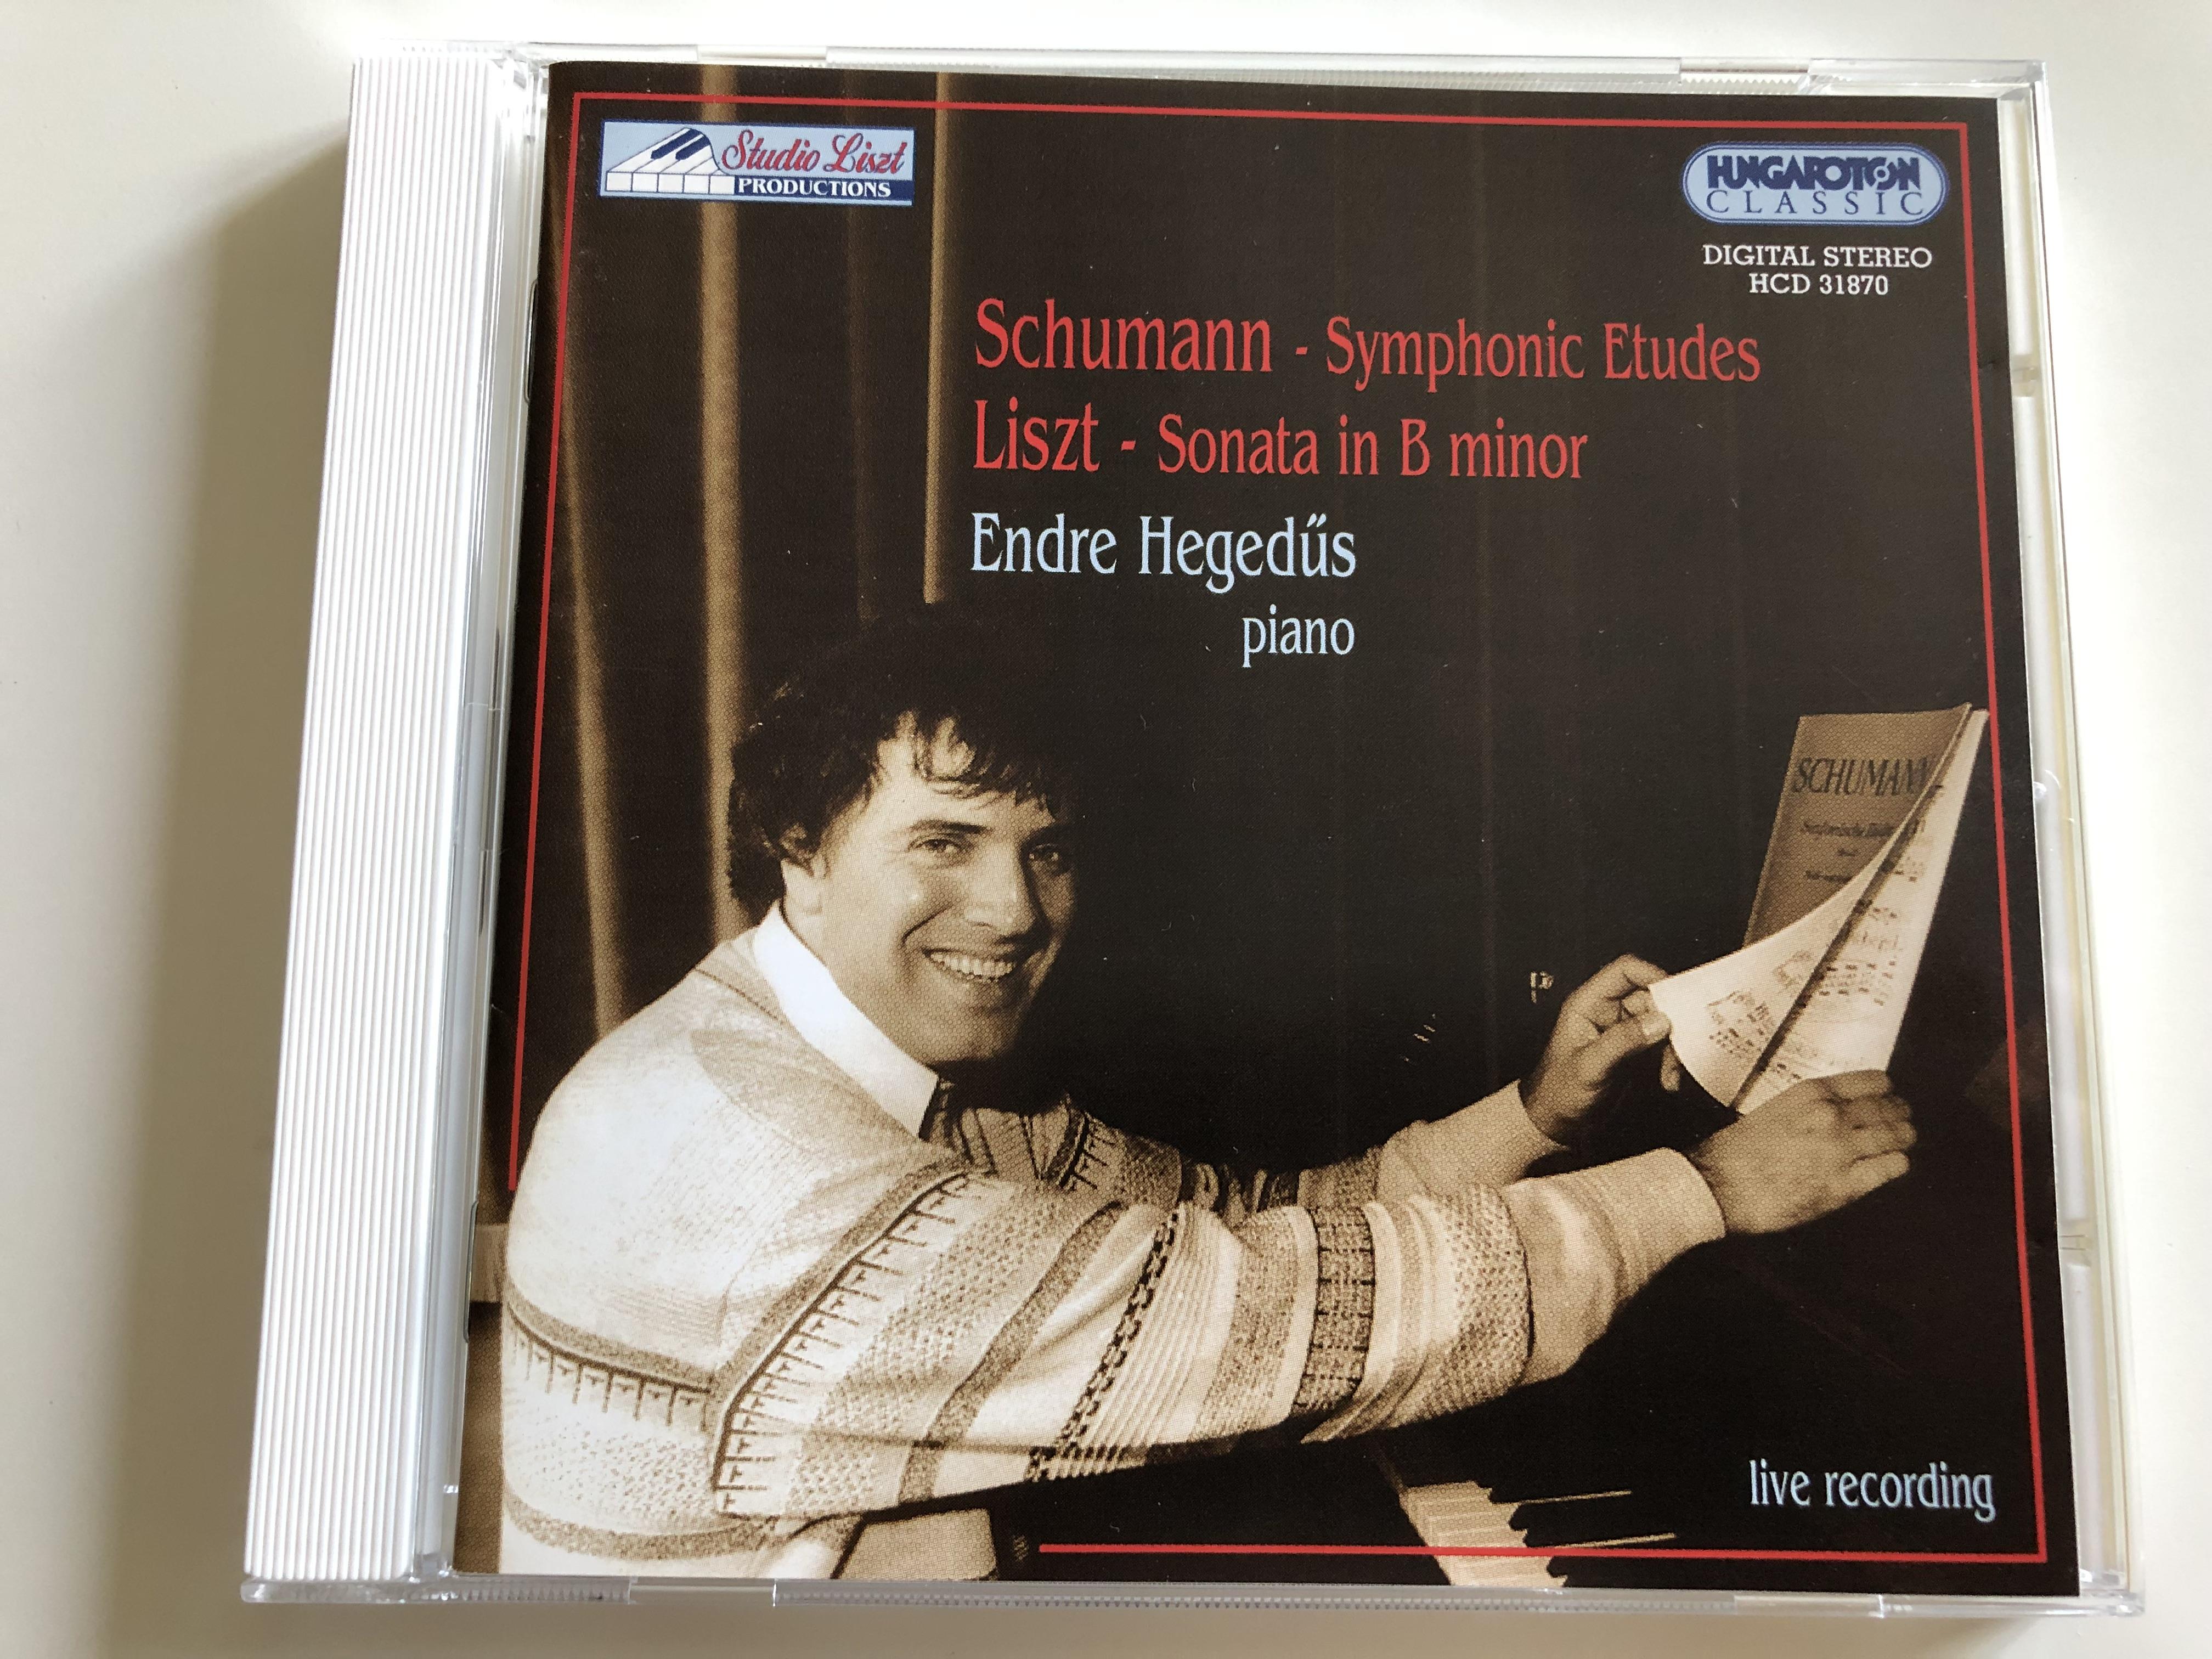 schumann-symphonic-etudes-liszt-sonata-in-b-minor-endre-heged-s-piano-live-recording-hungaroton-classic-audio-cd-1999-hcd-31870-1-.jpg